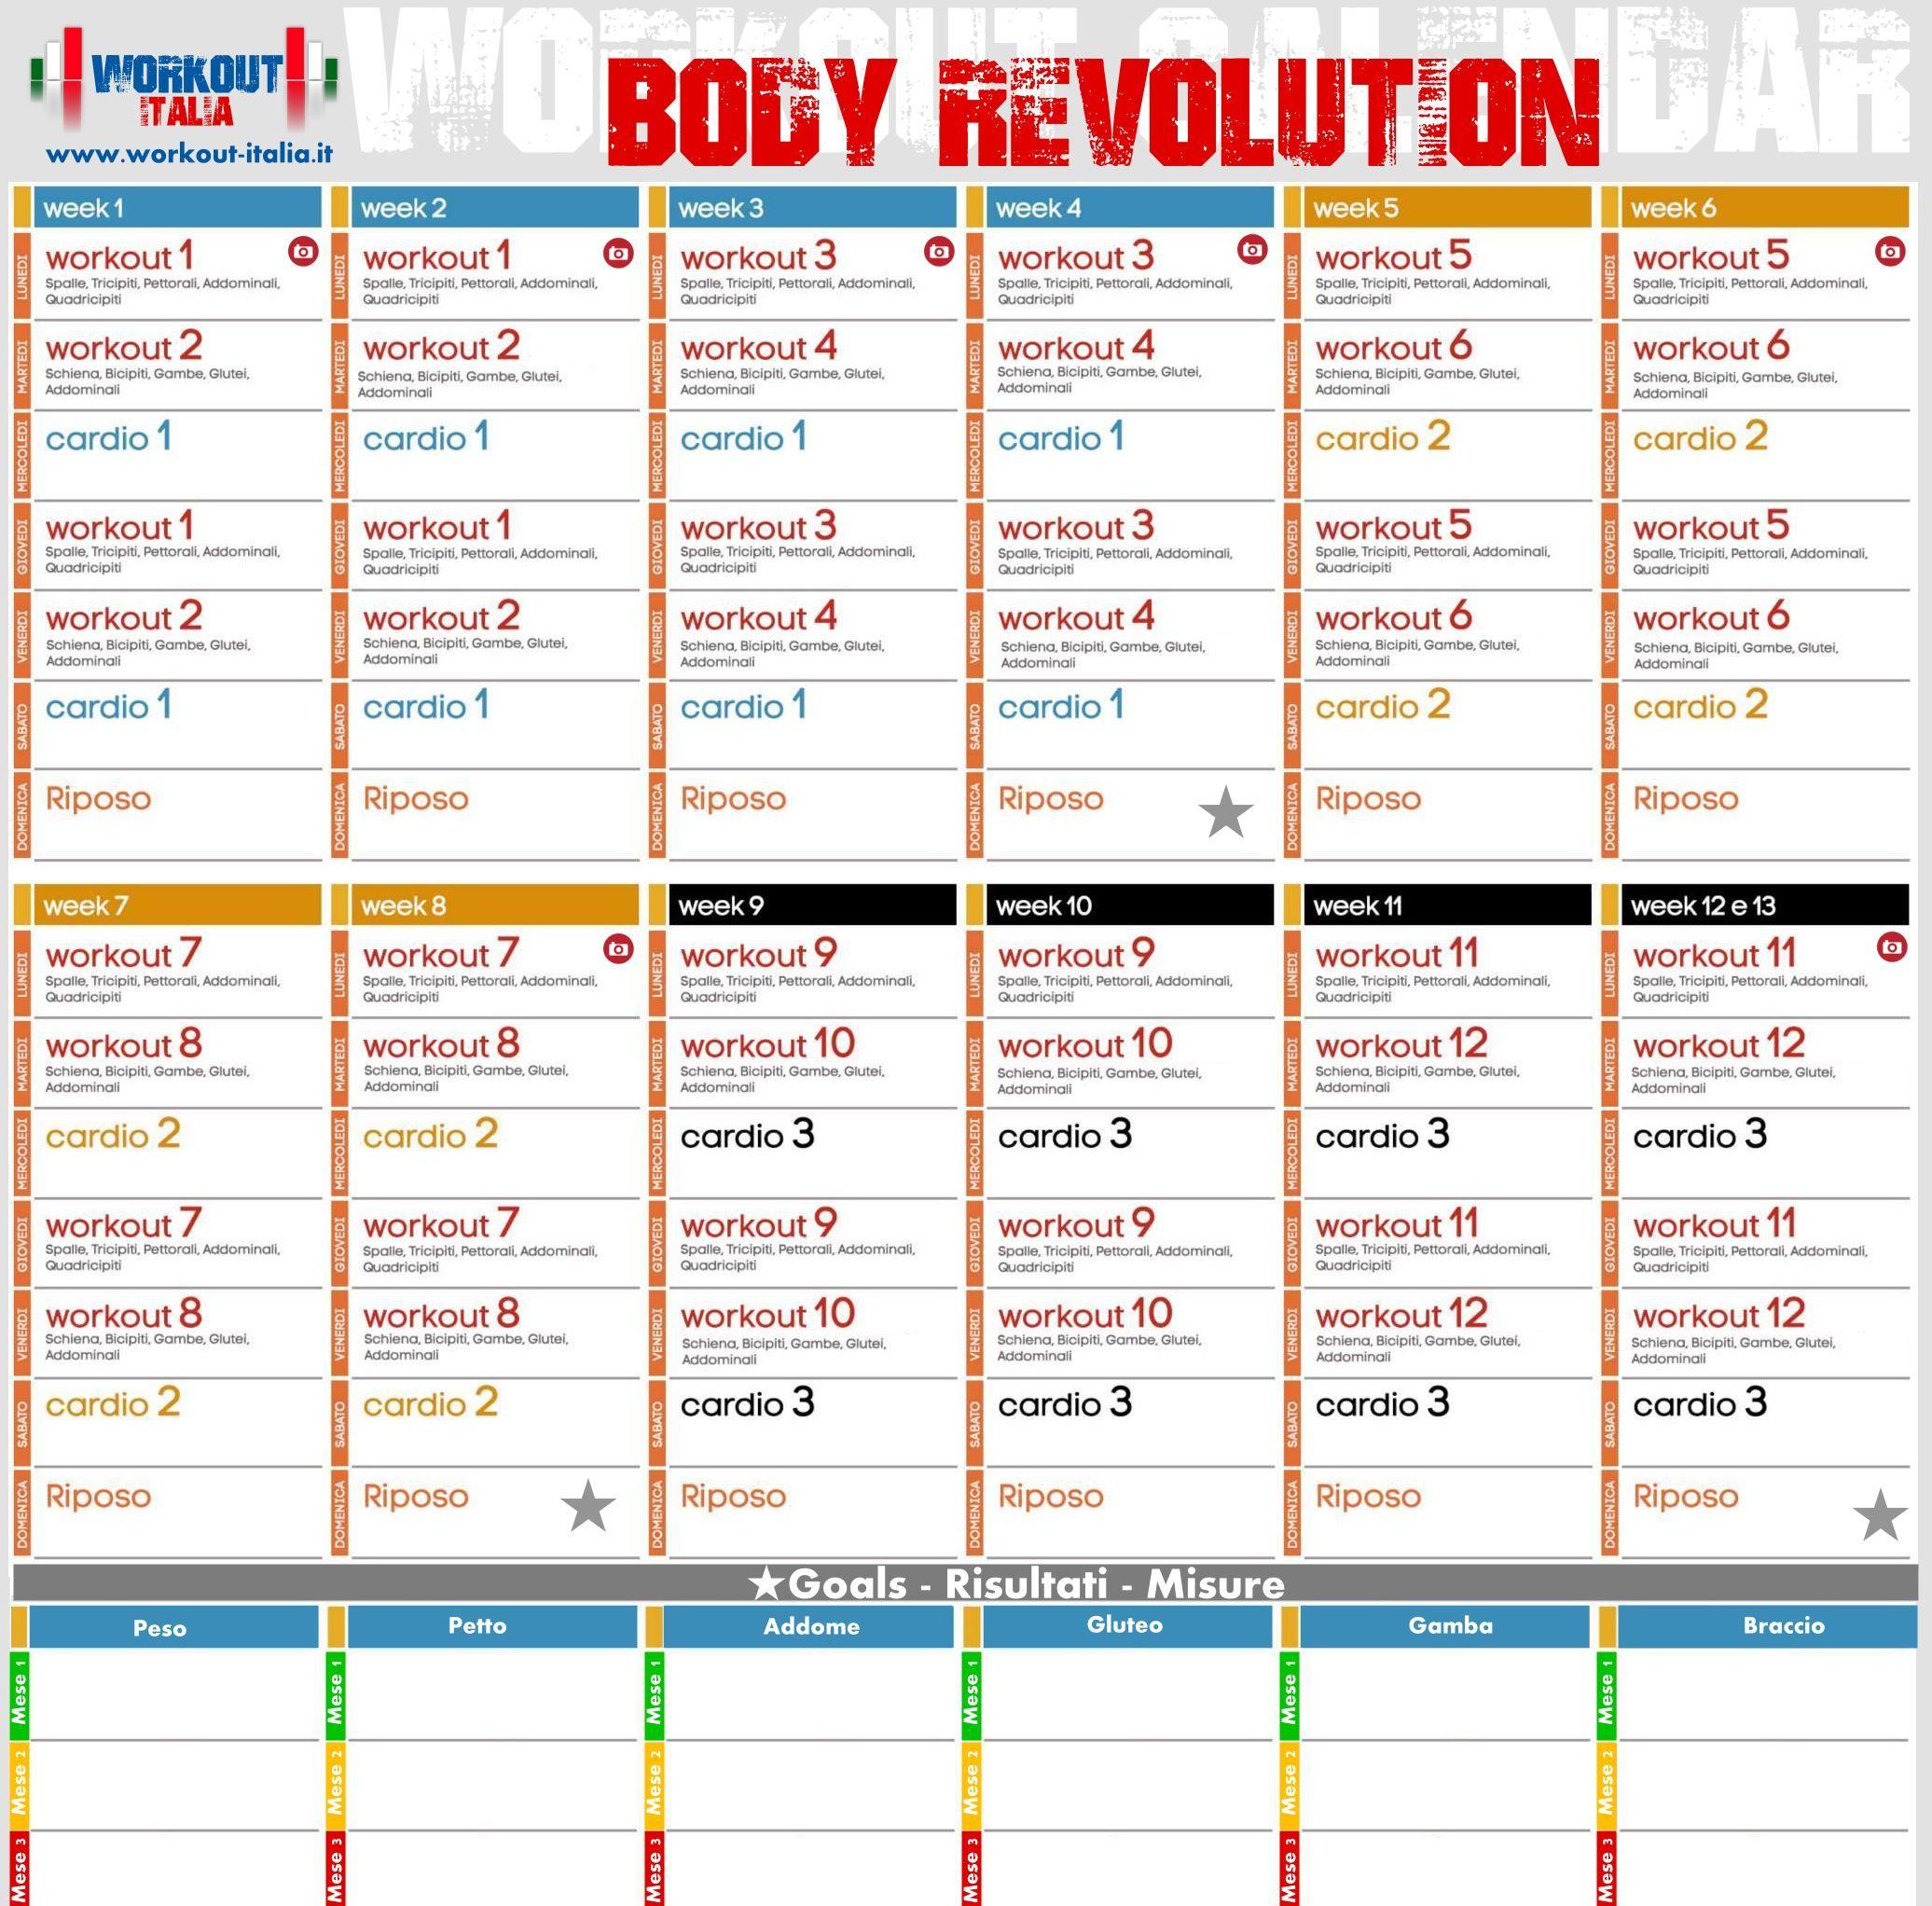 8 Best Jillian Michaels Images | Jillian Michaels, Body Pertaining To Body Revolution Jillian Michaels Calendar Pdf